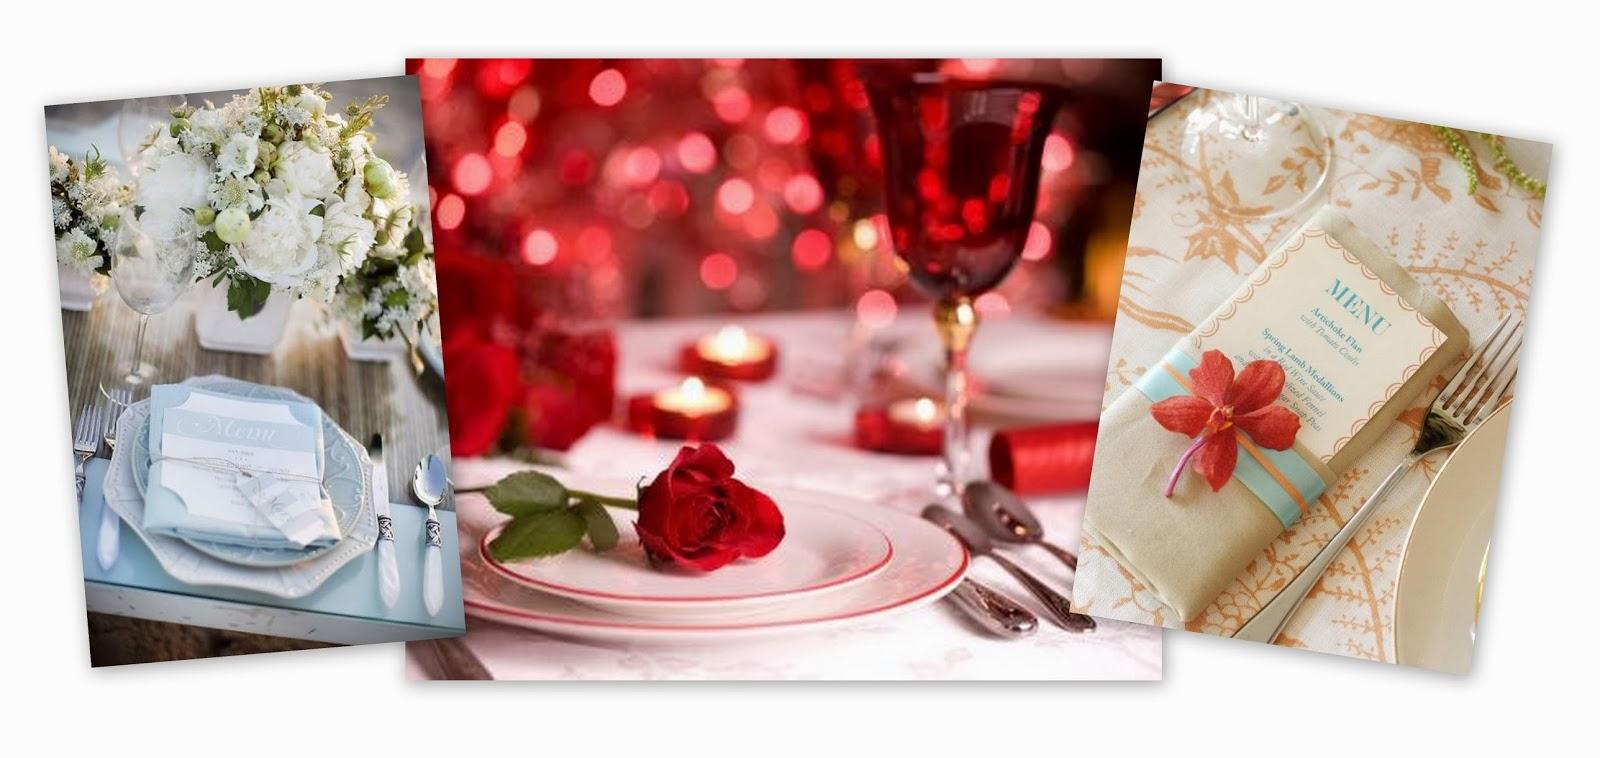 Table Setting, Dinner Menu, Romantic, Placecards